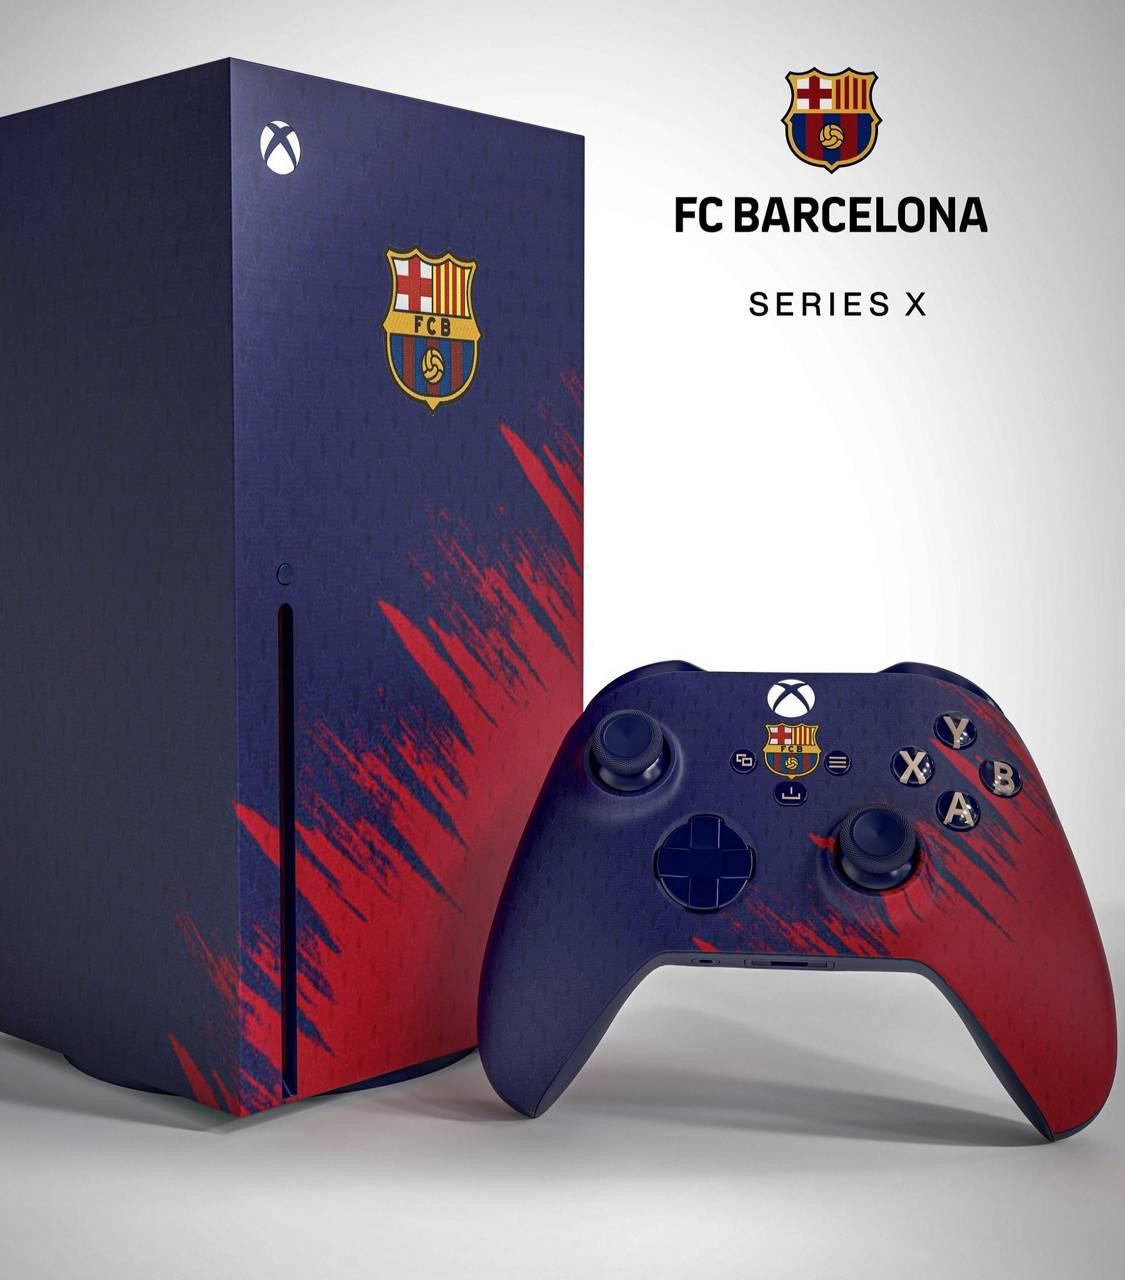 X Box FCB